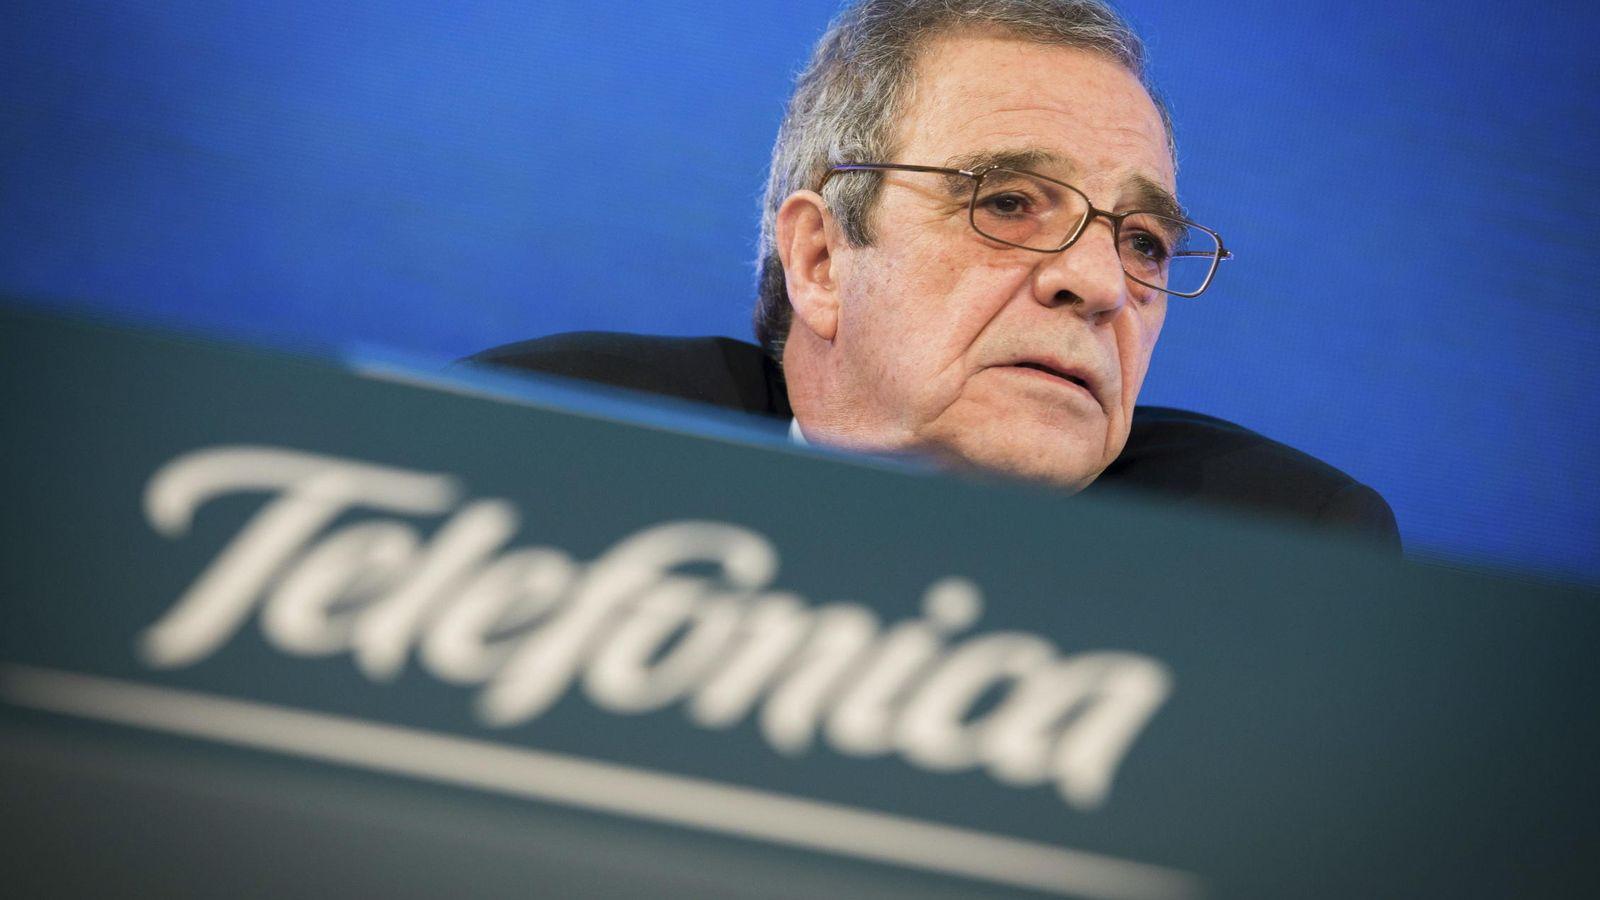 Foto: César Alierta, presidente de Telefónica. (Reuters)